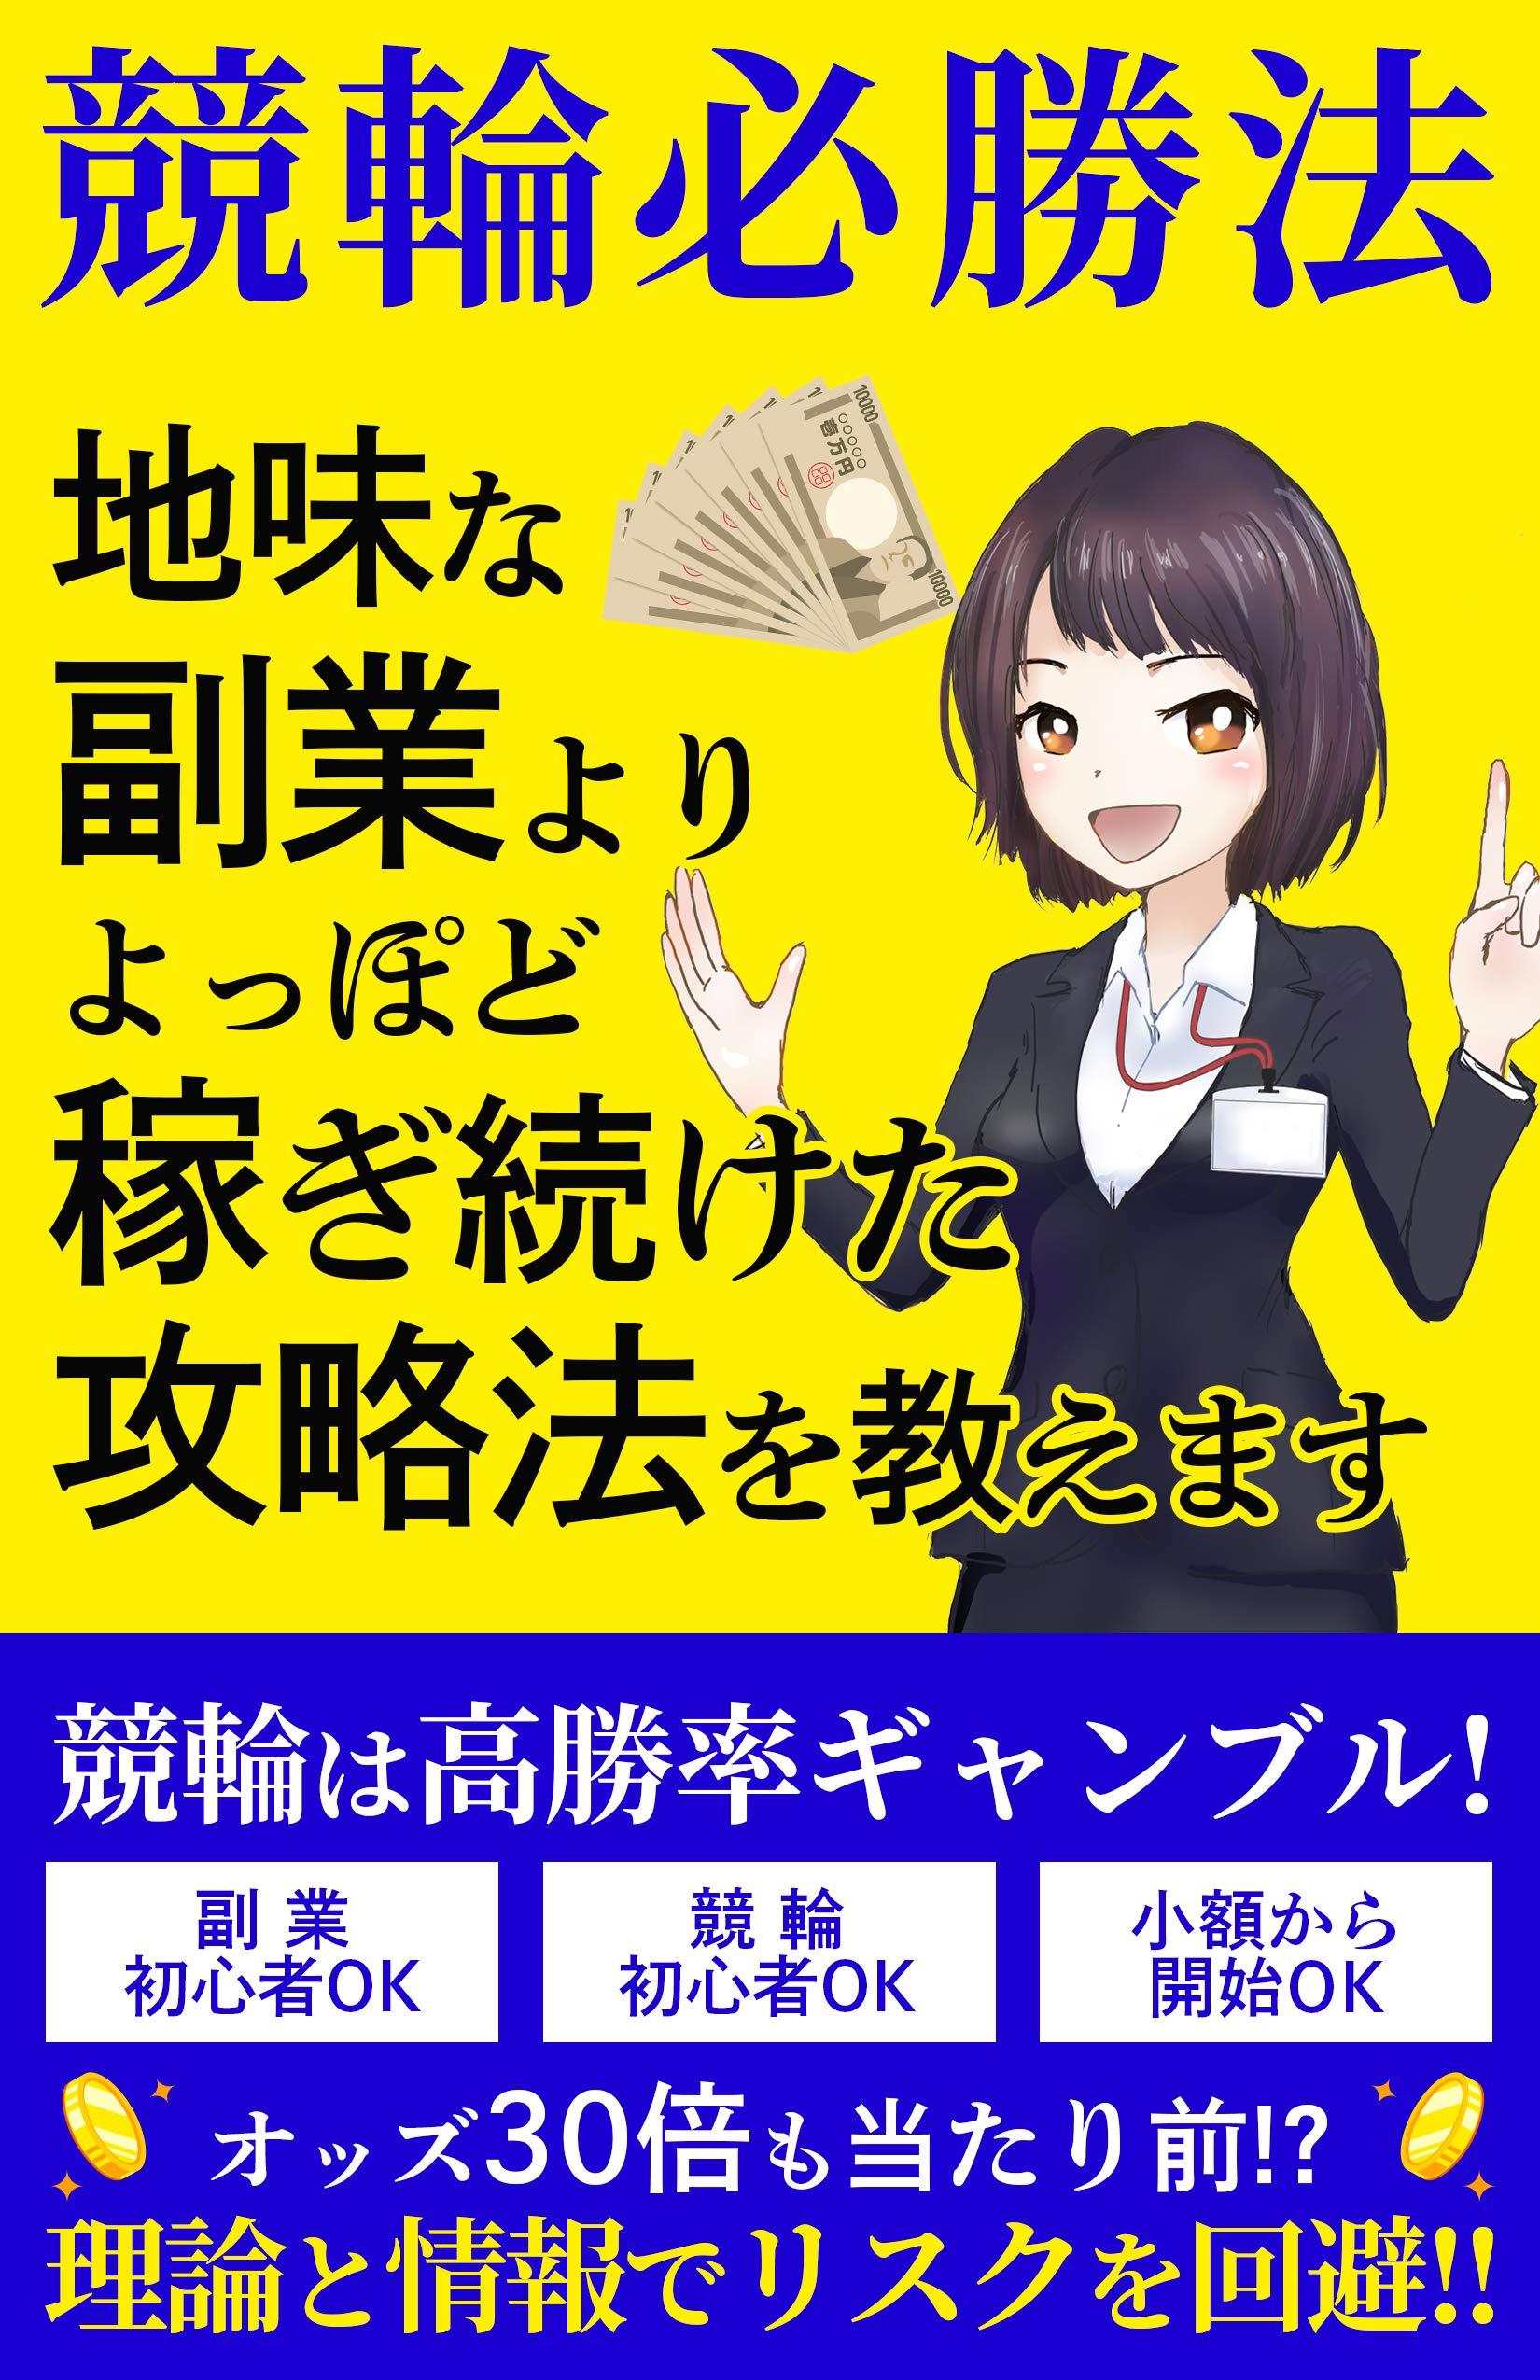 keirin hisyouhou: jimina hukugyoyori yoppodokasegituduketa kouryakuhouwo osiemasu (Japanese Edition)